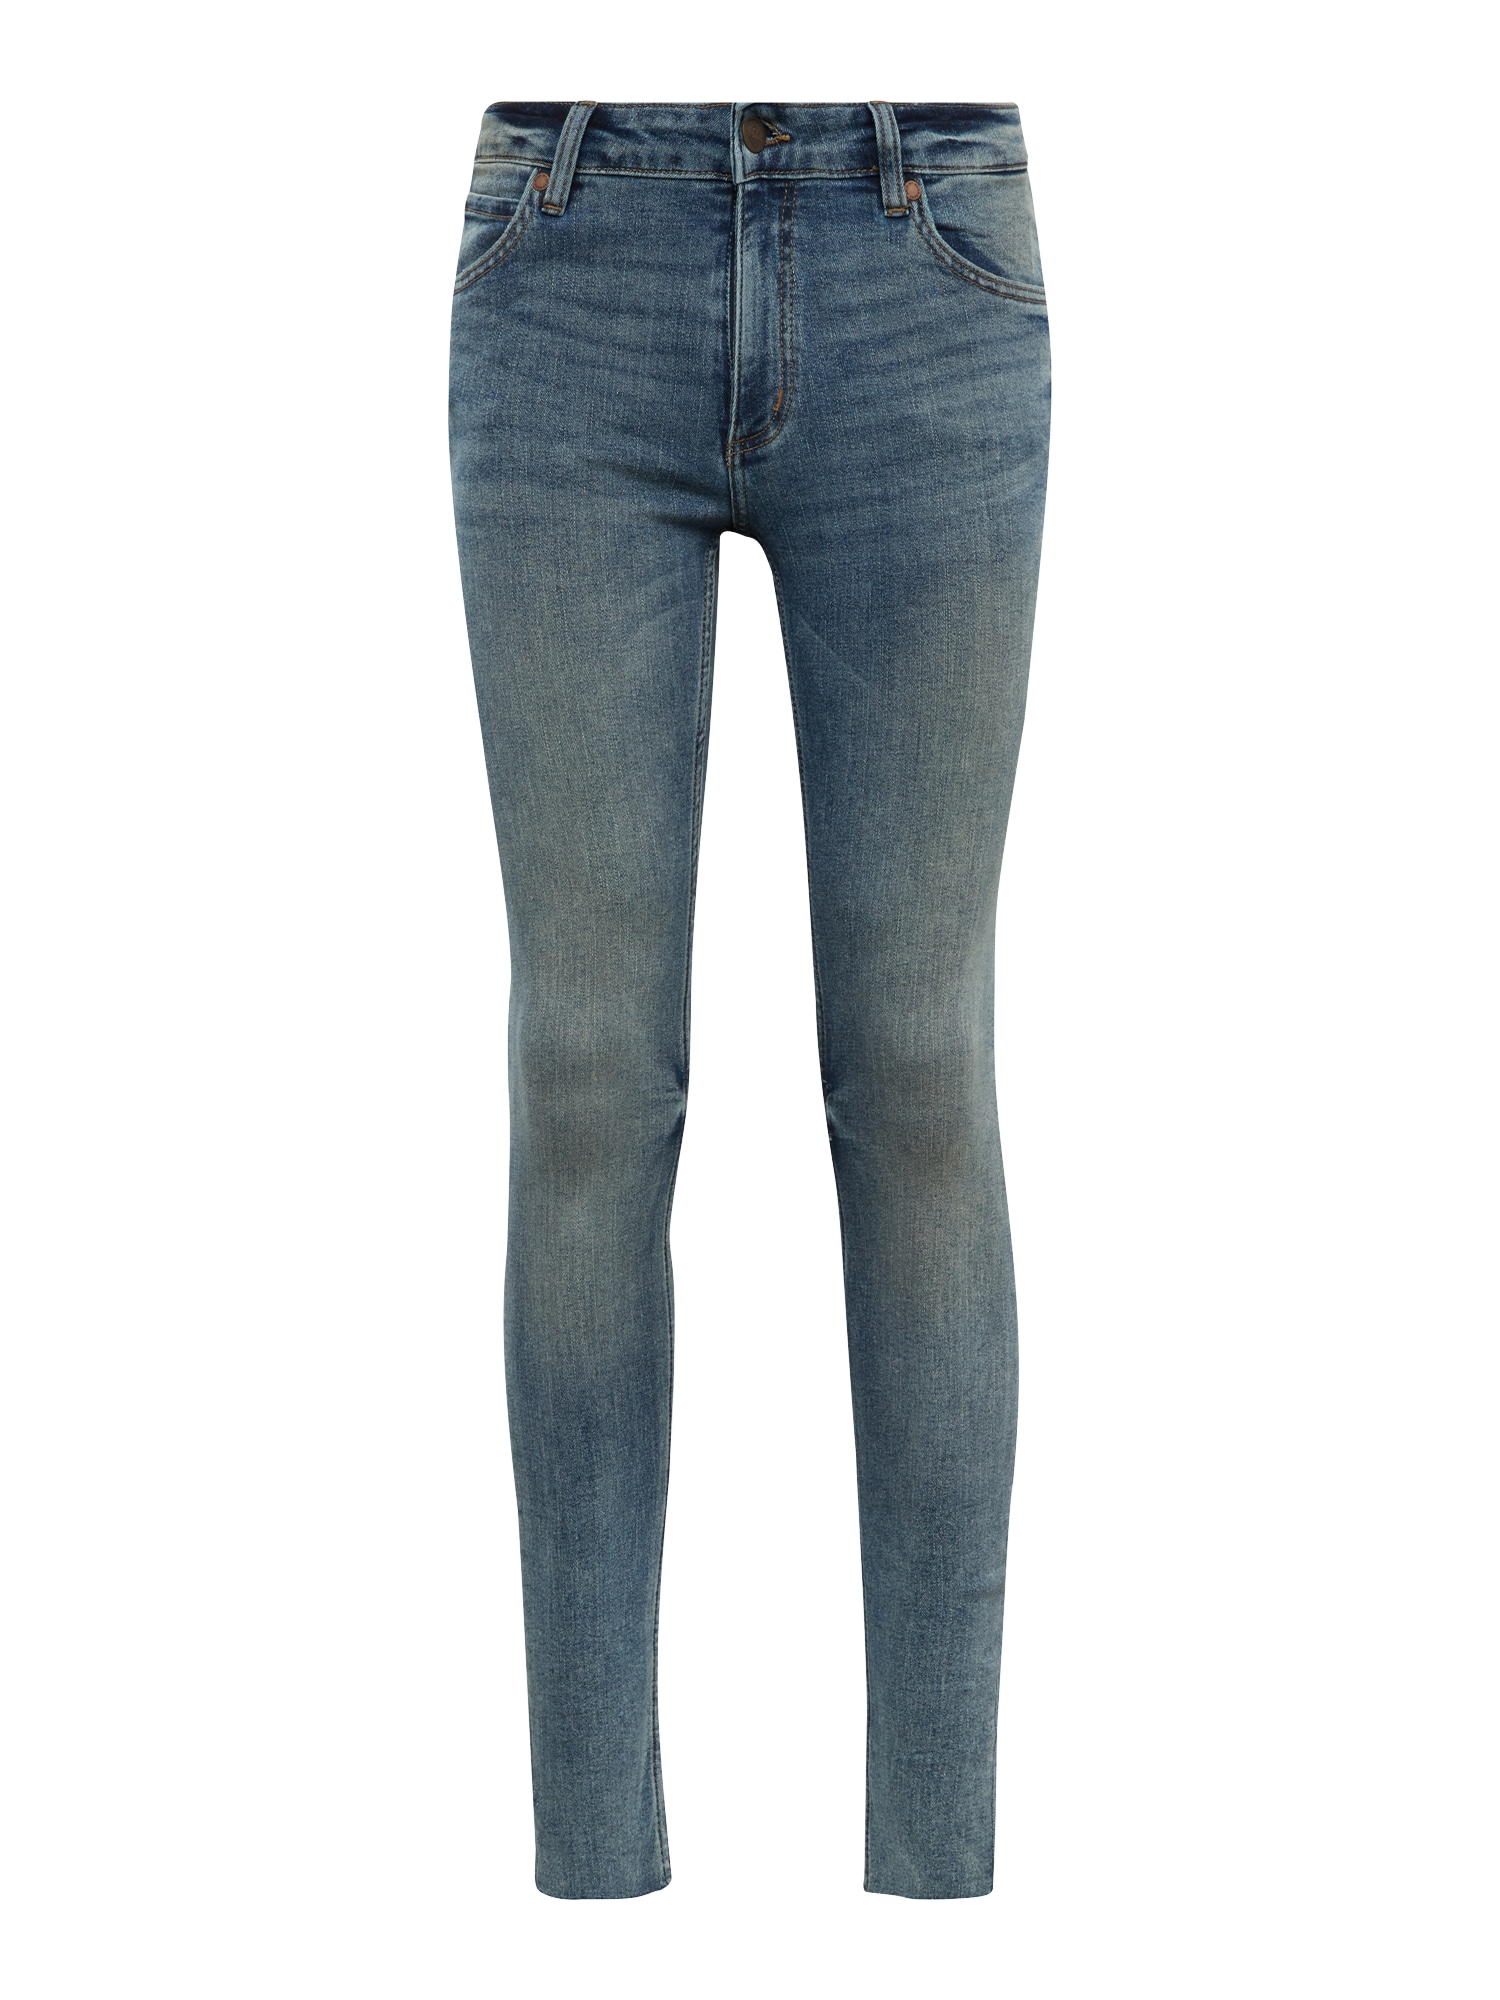 CHEAP MONDAY Heren Jeans blauw denim